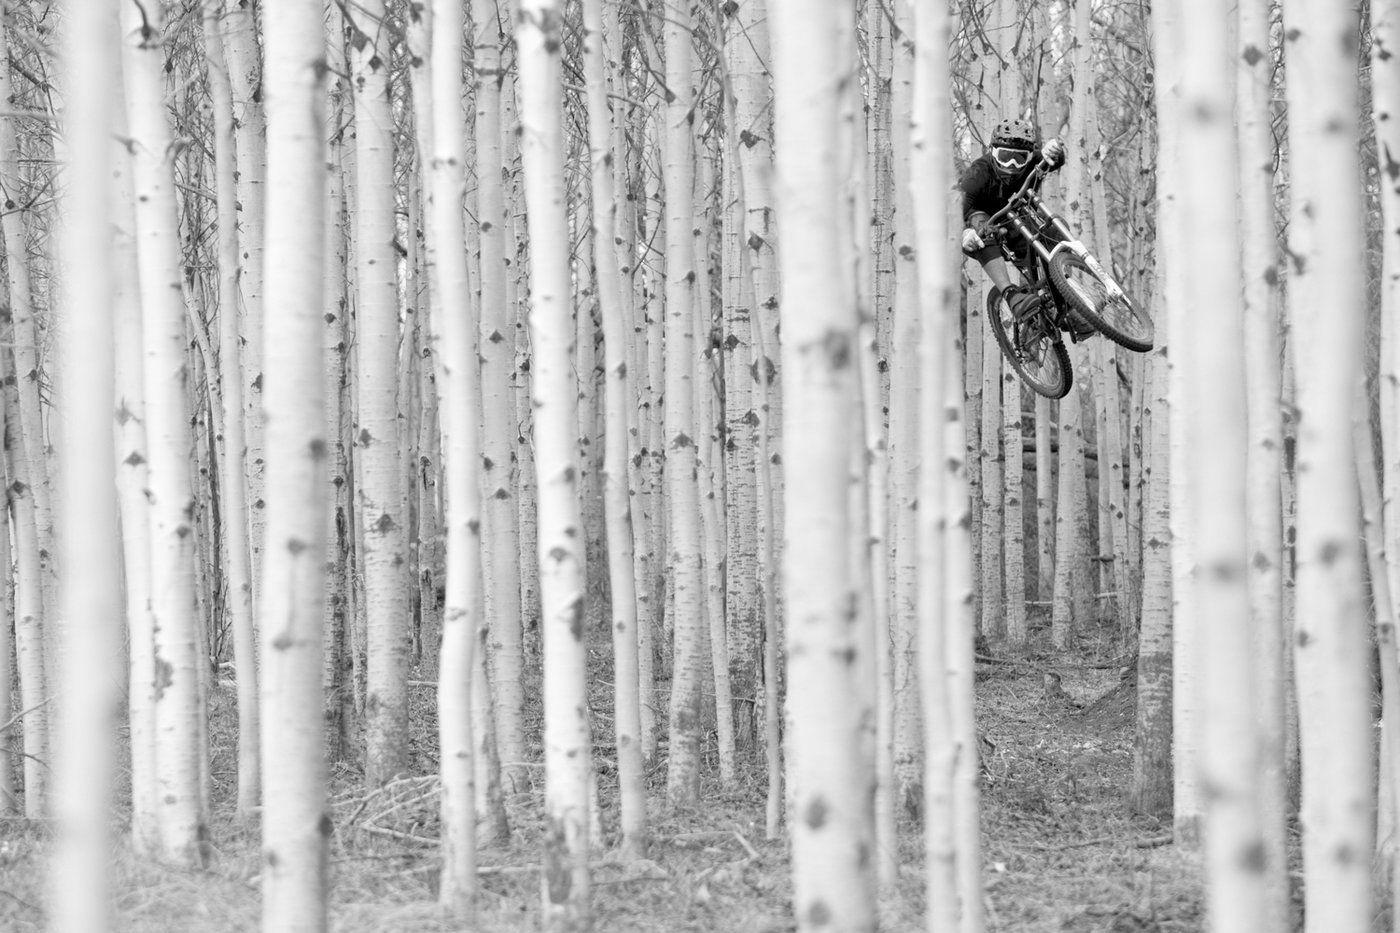 5 days left!       Photographer: Sterling Lorence, Athlete: Matt Hunter Location: Kamloops, BC, Canada